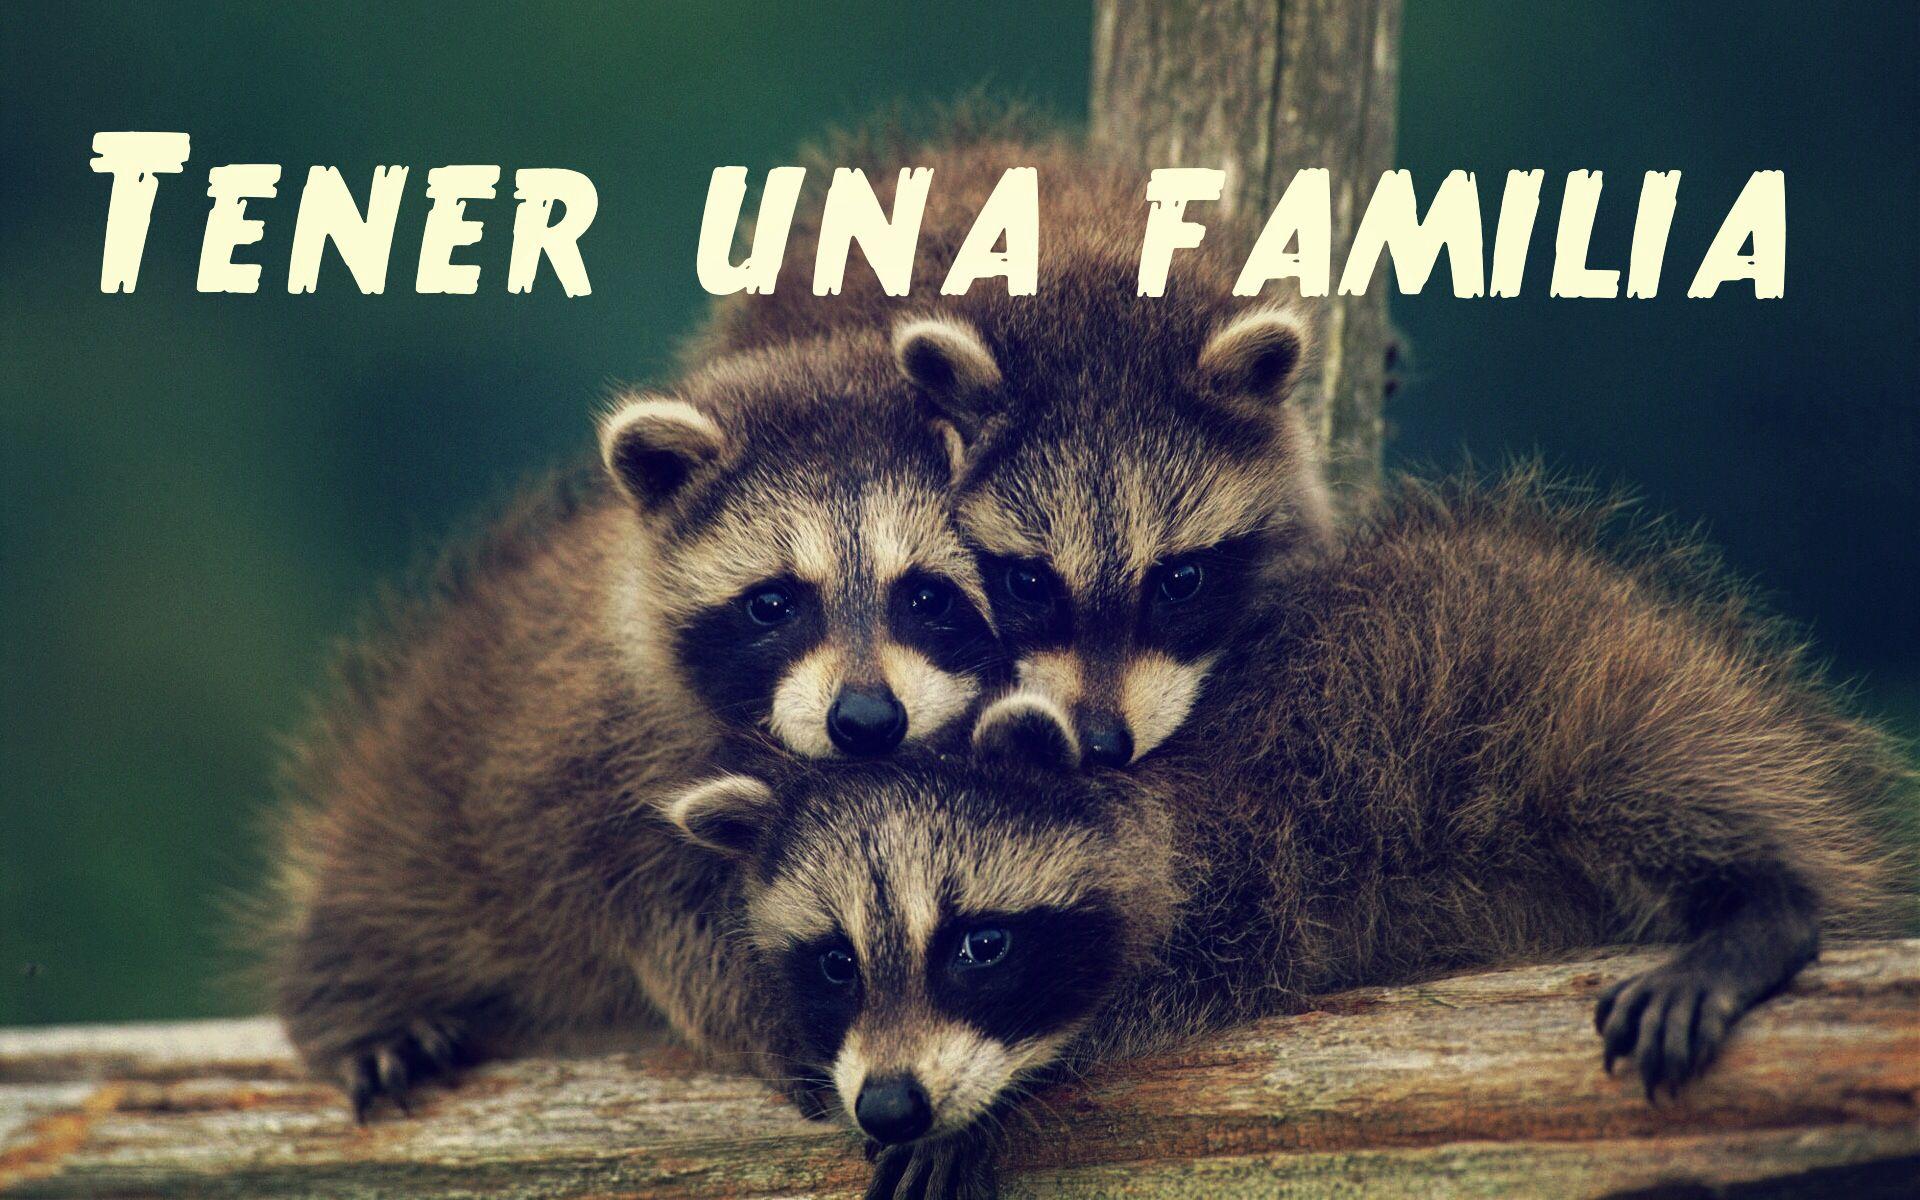 Tener una familia